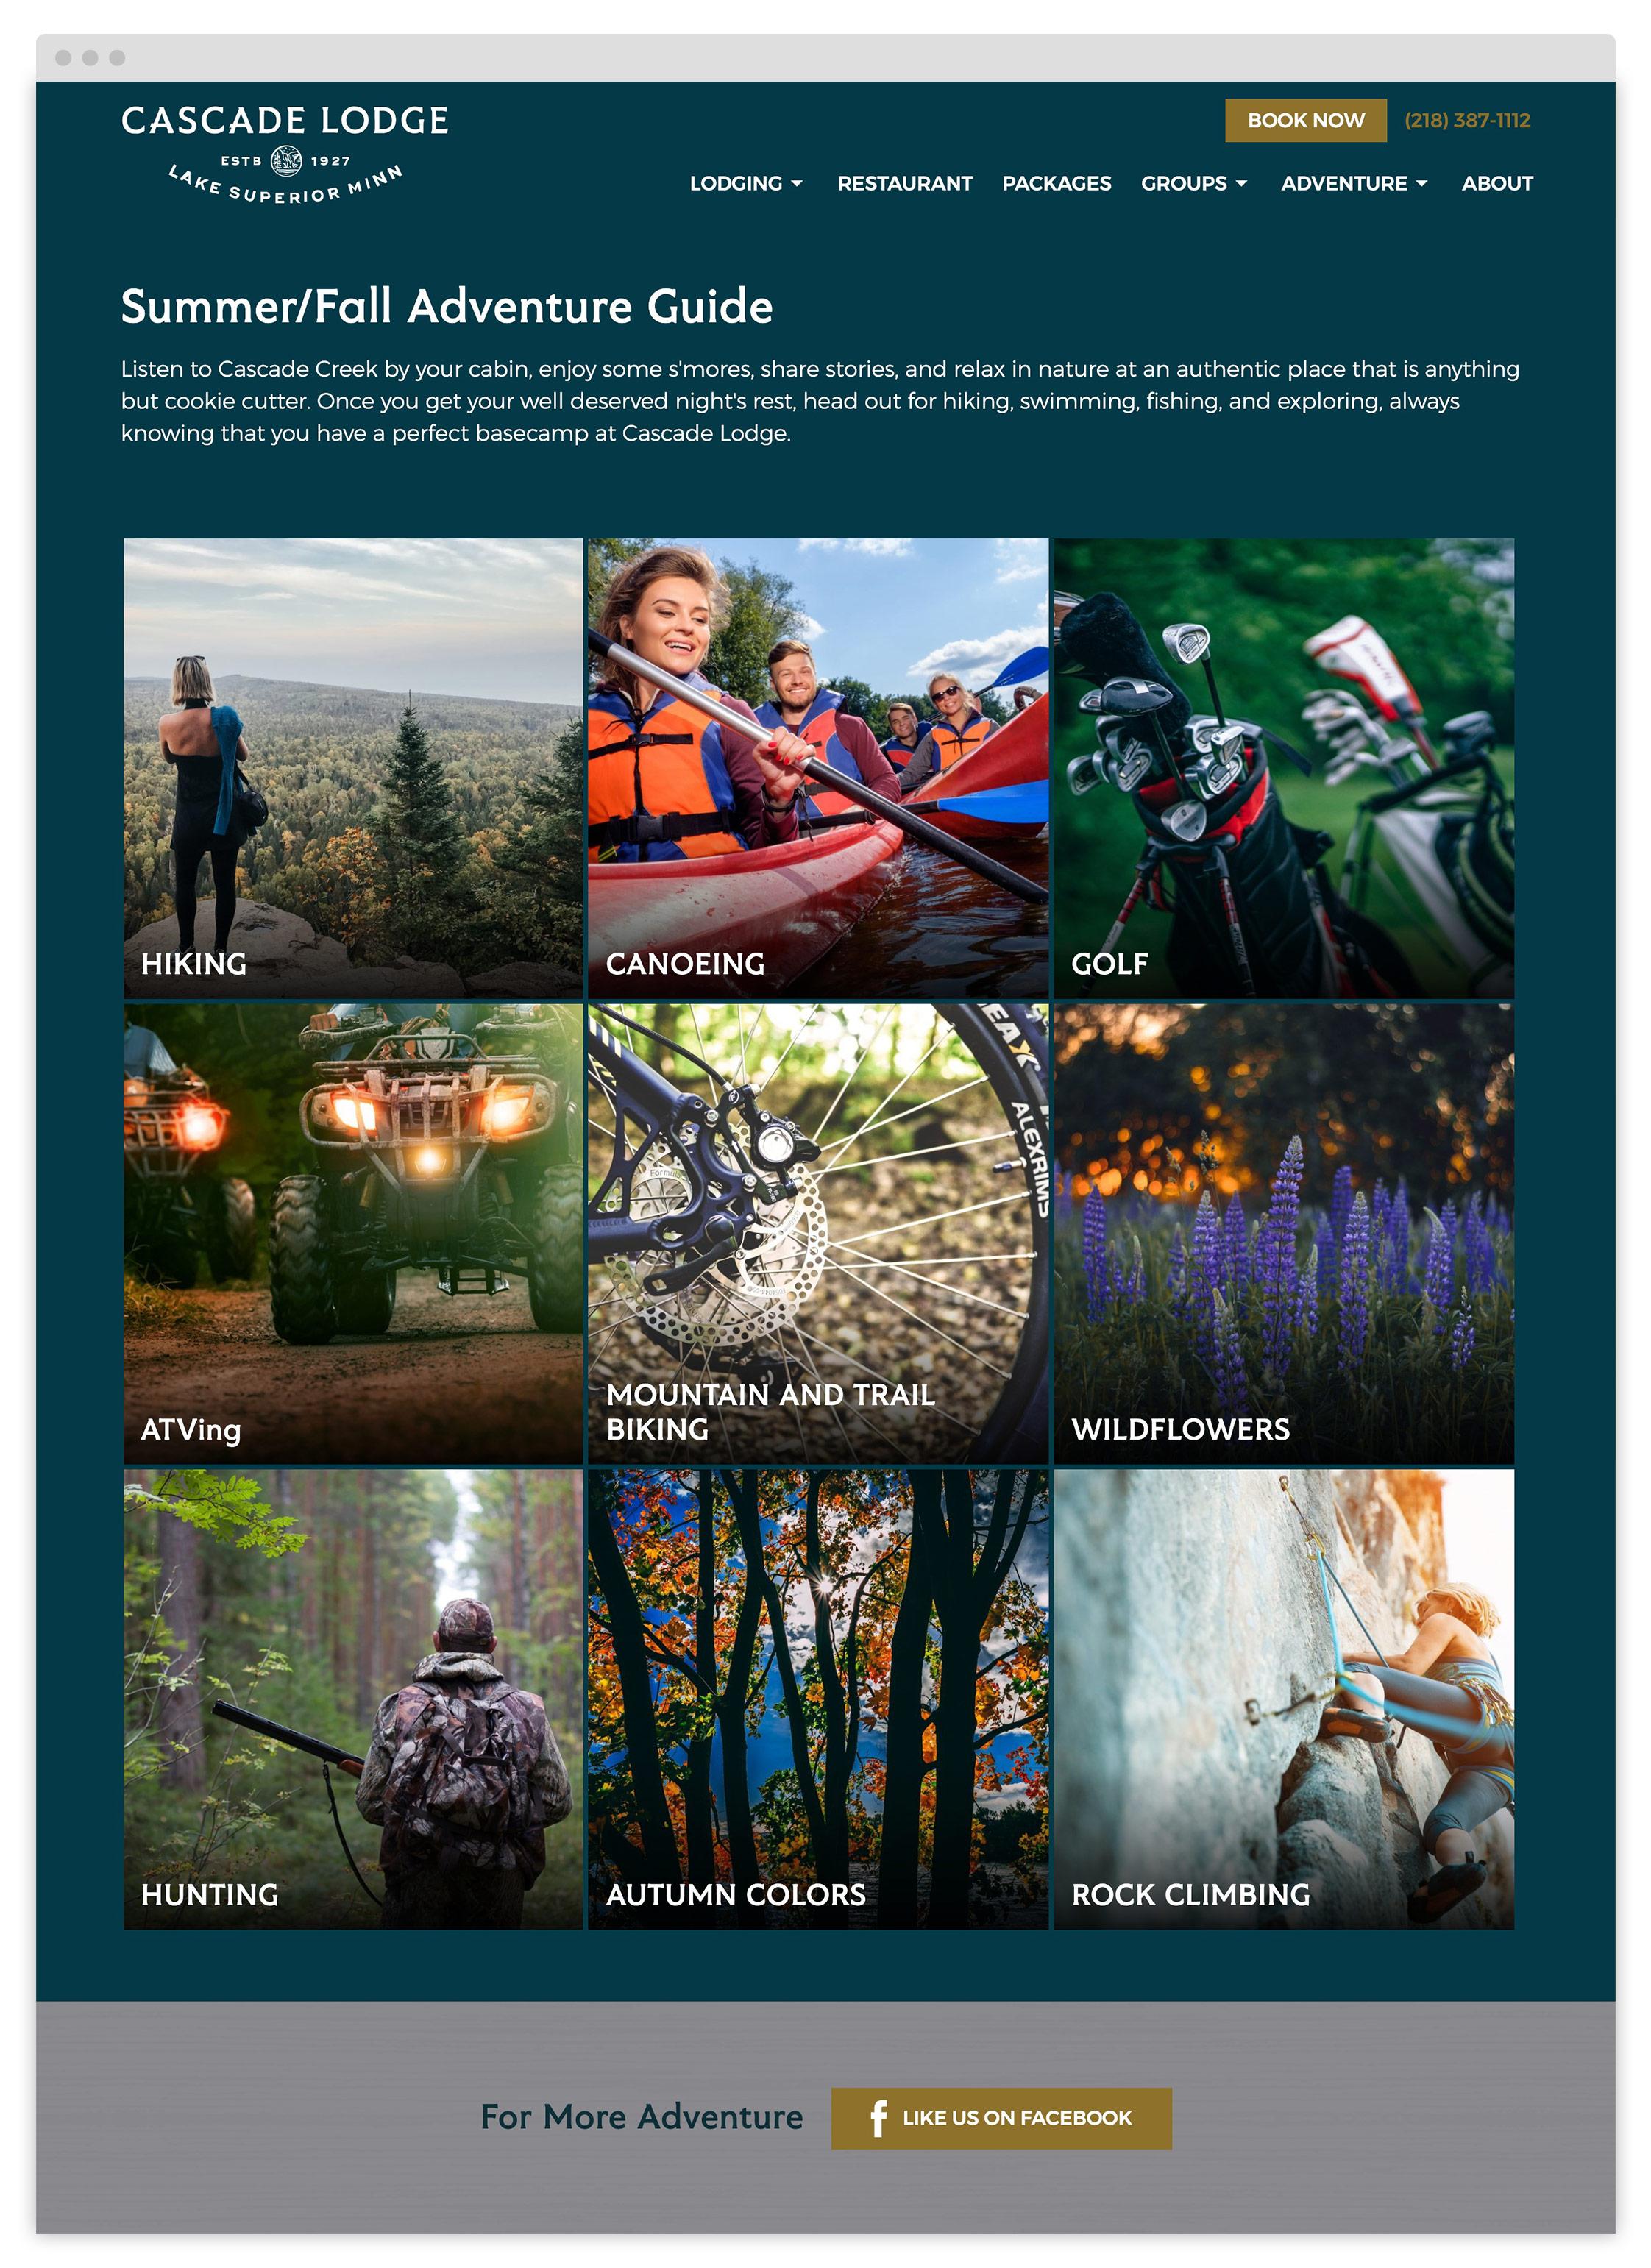 Adventure Guide Cascade Lodge